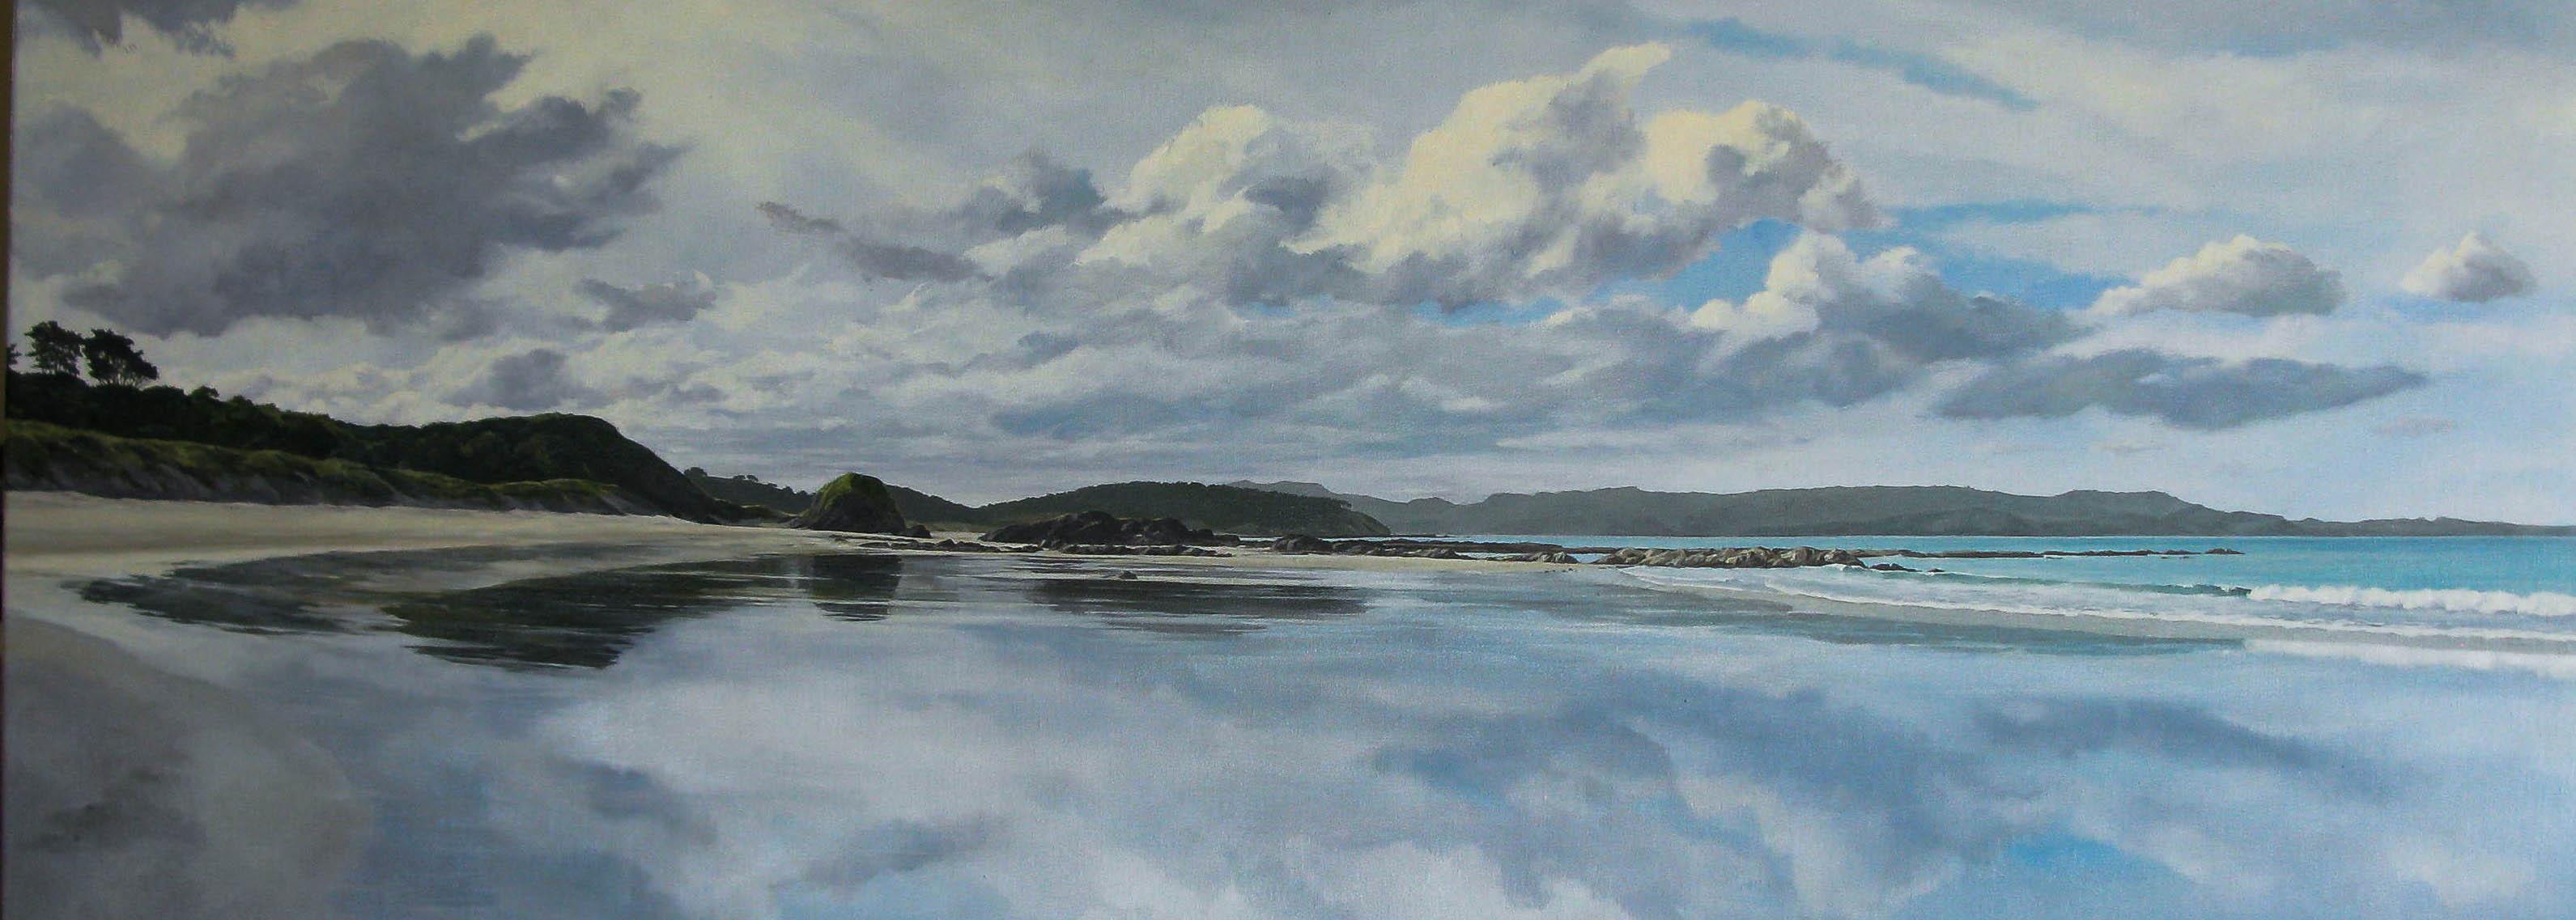 Reflections, Tauwharanui Peninsula